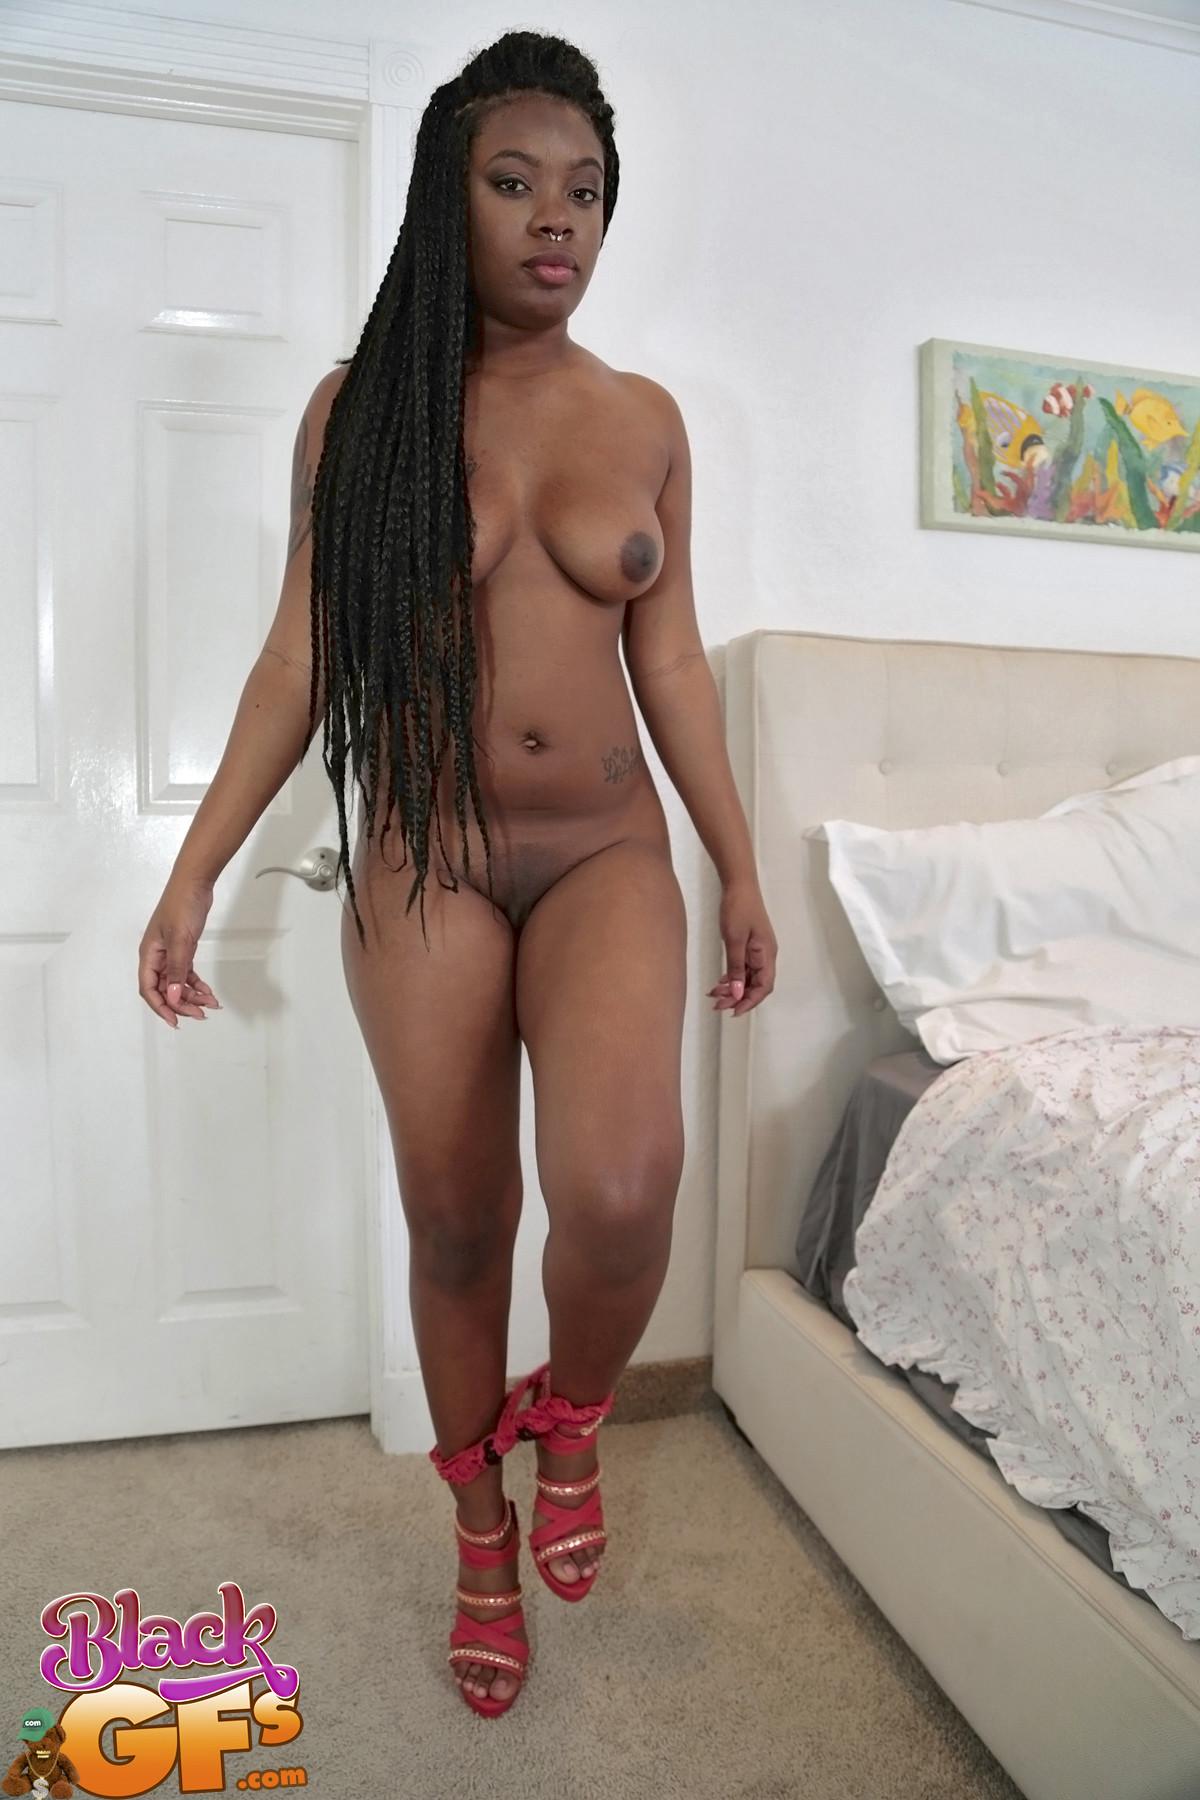 London Banks - Thats My Girl - Black Gfs 68111-5825